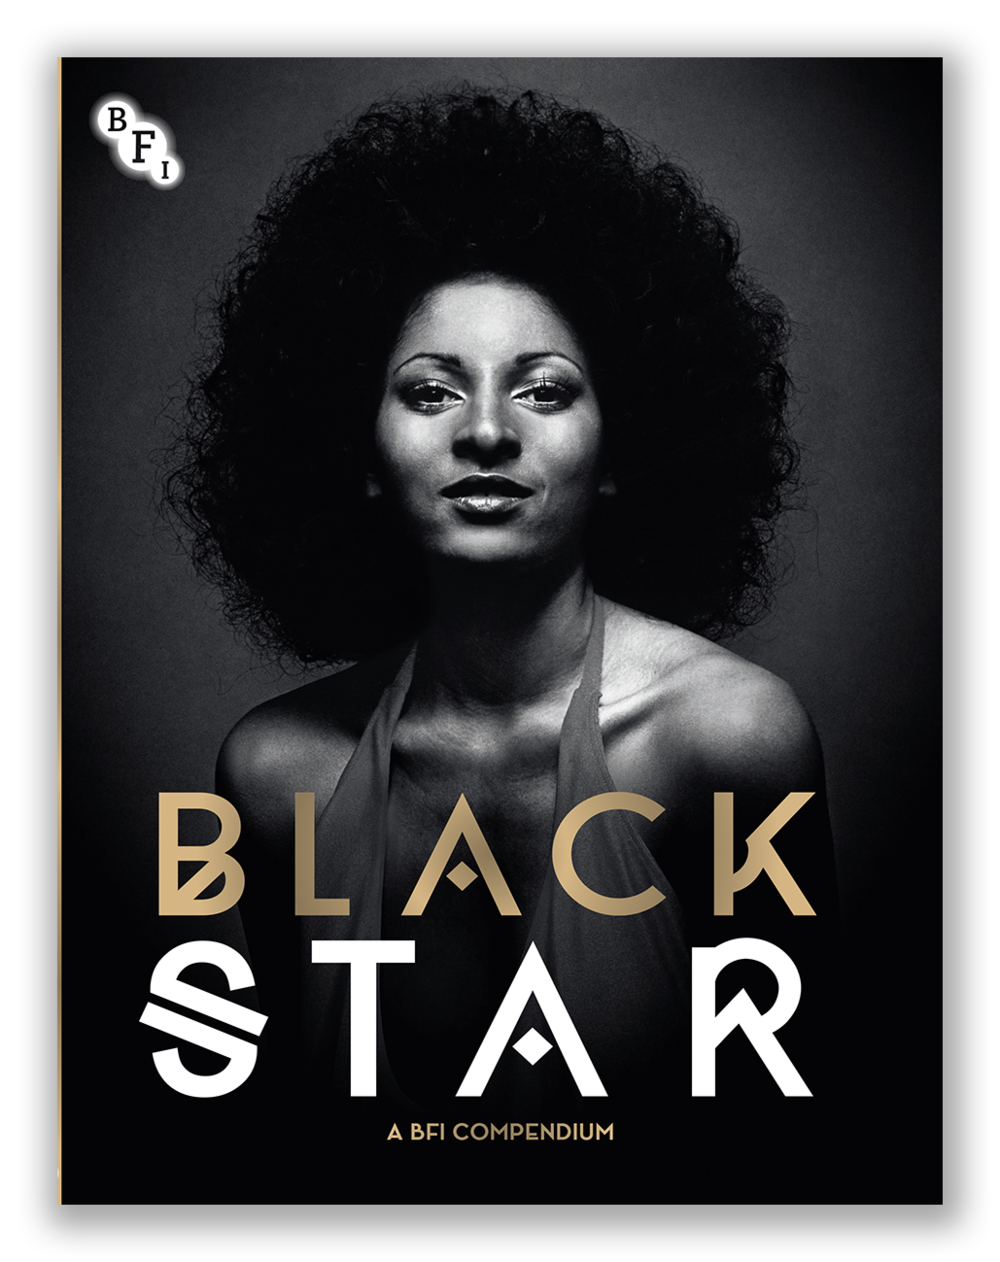 BlackStarCover2D.png